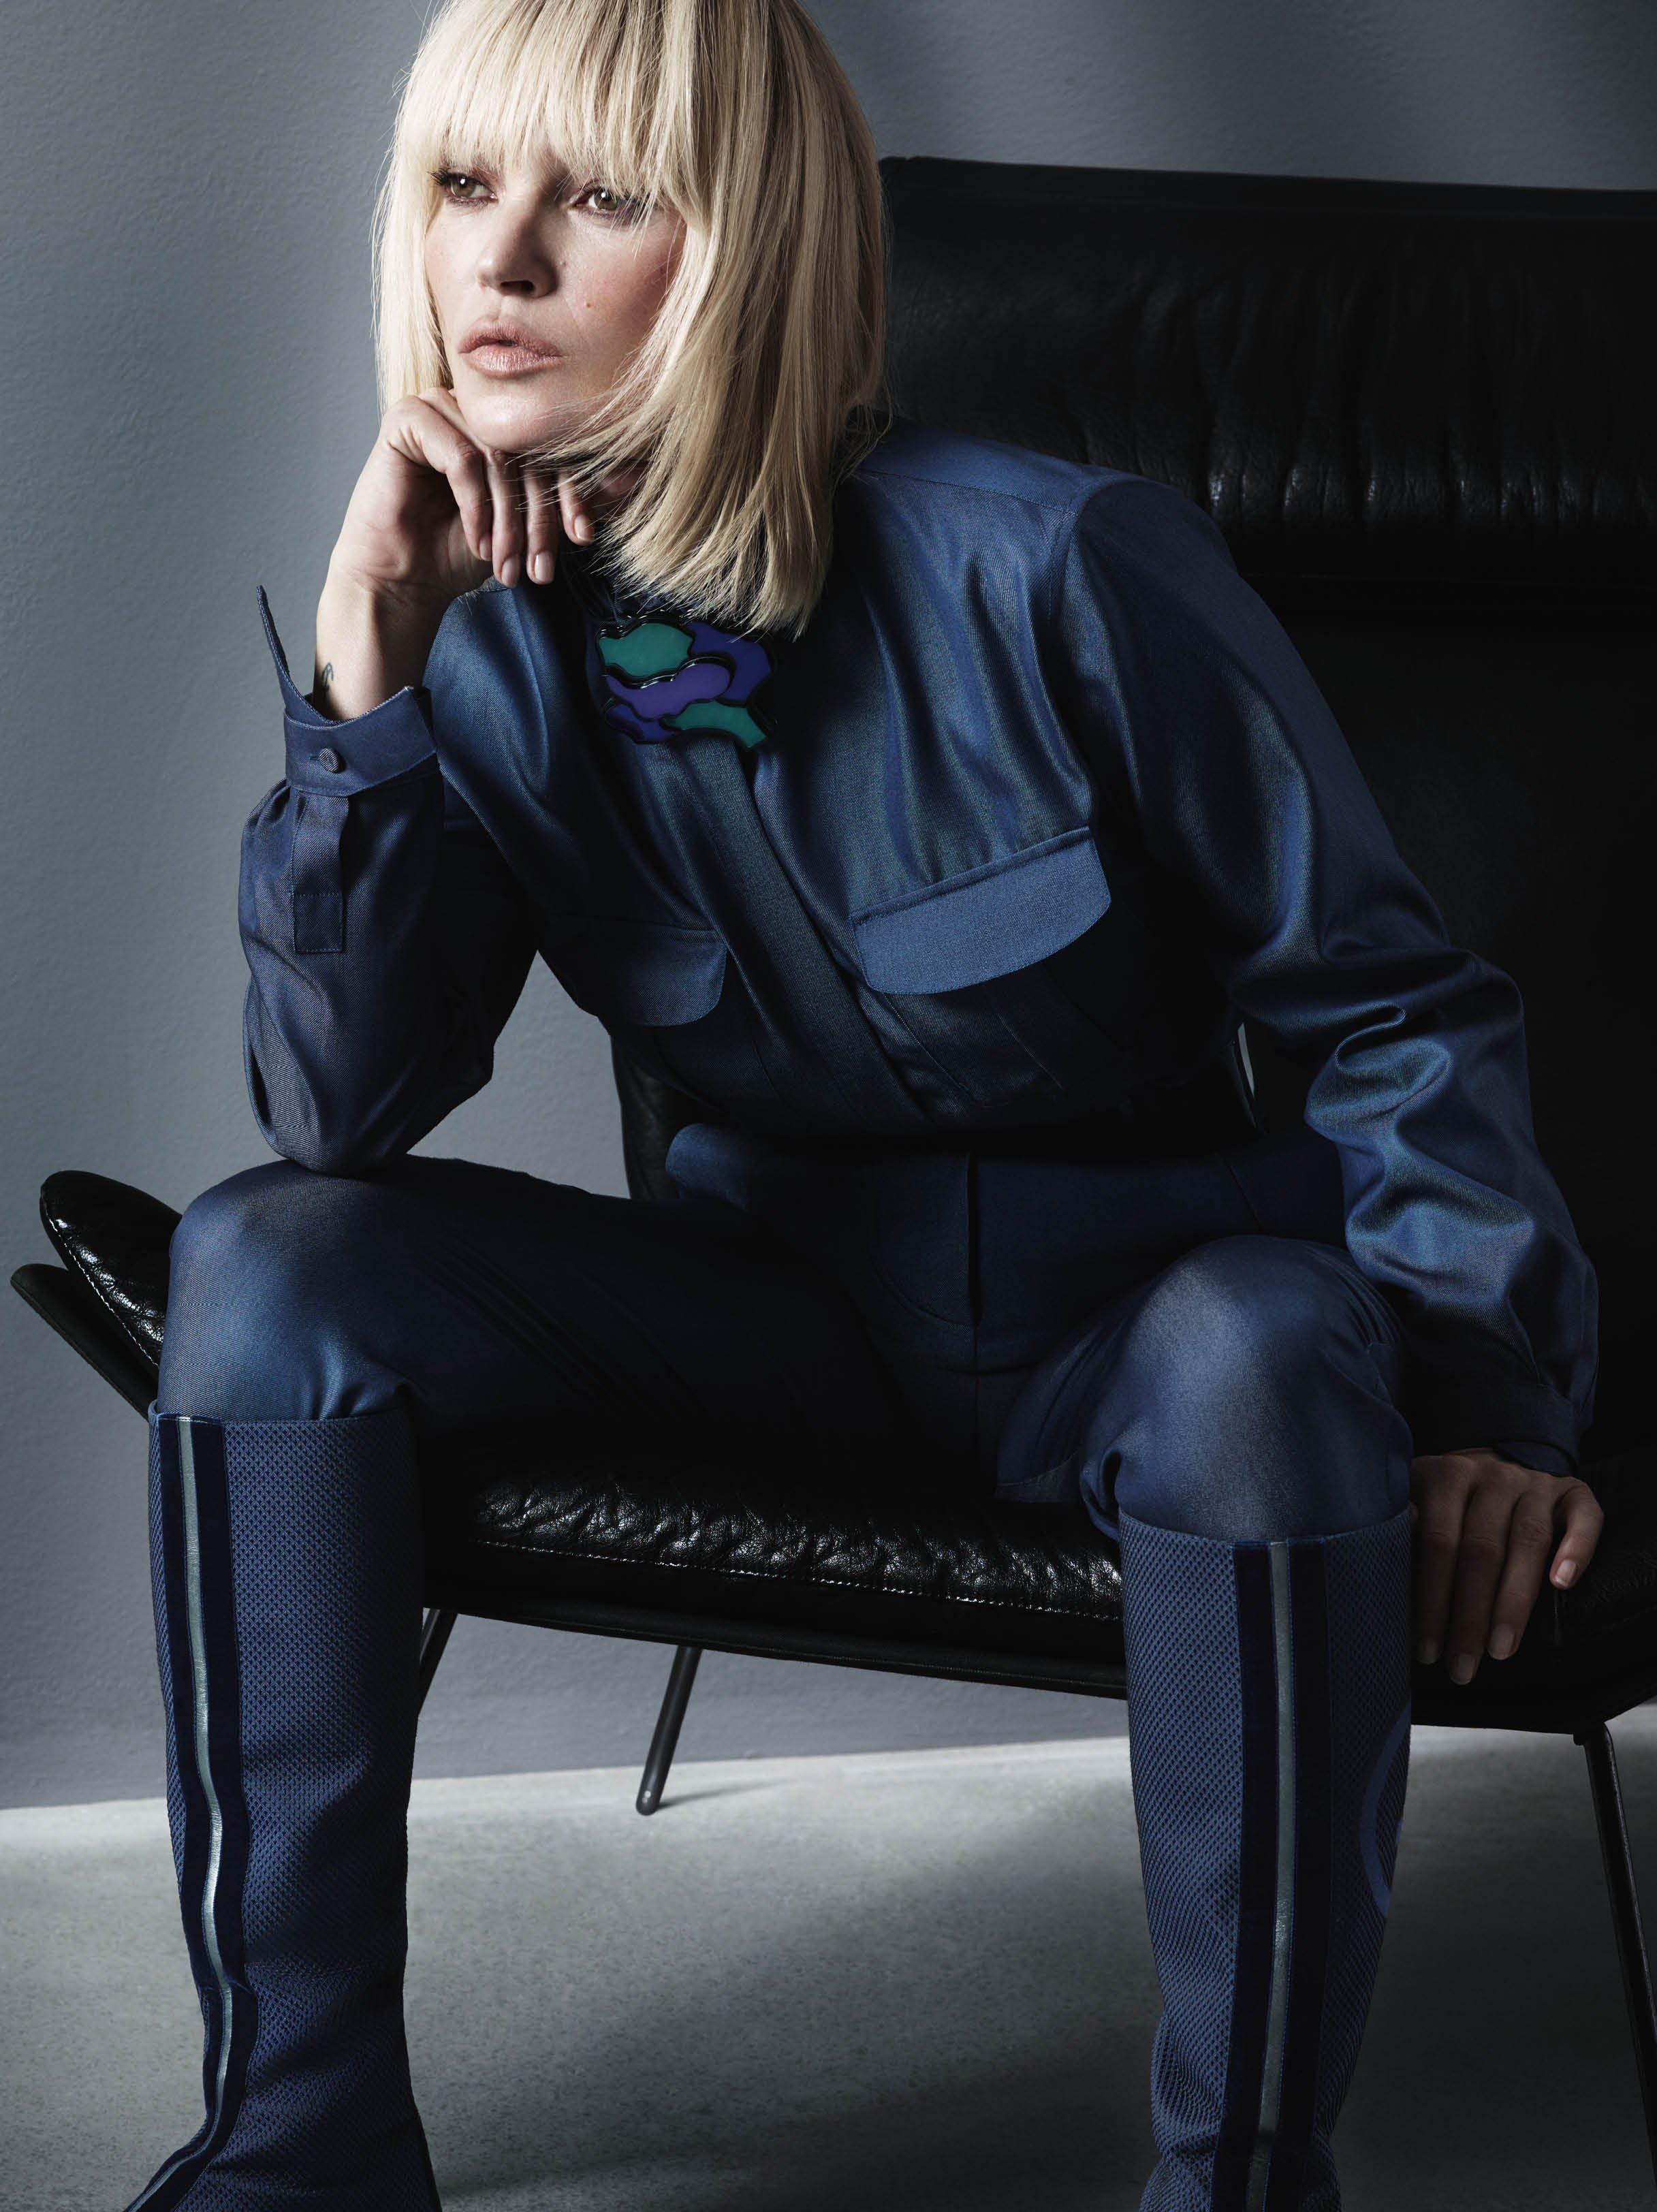 Armani e Kate Moss connubio perfetto